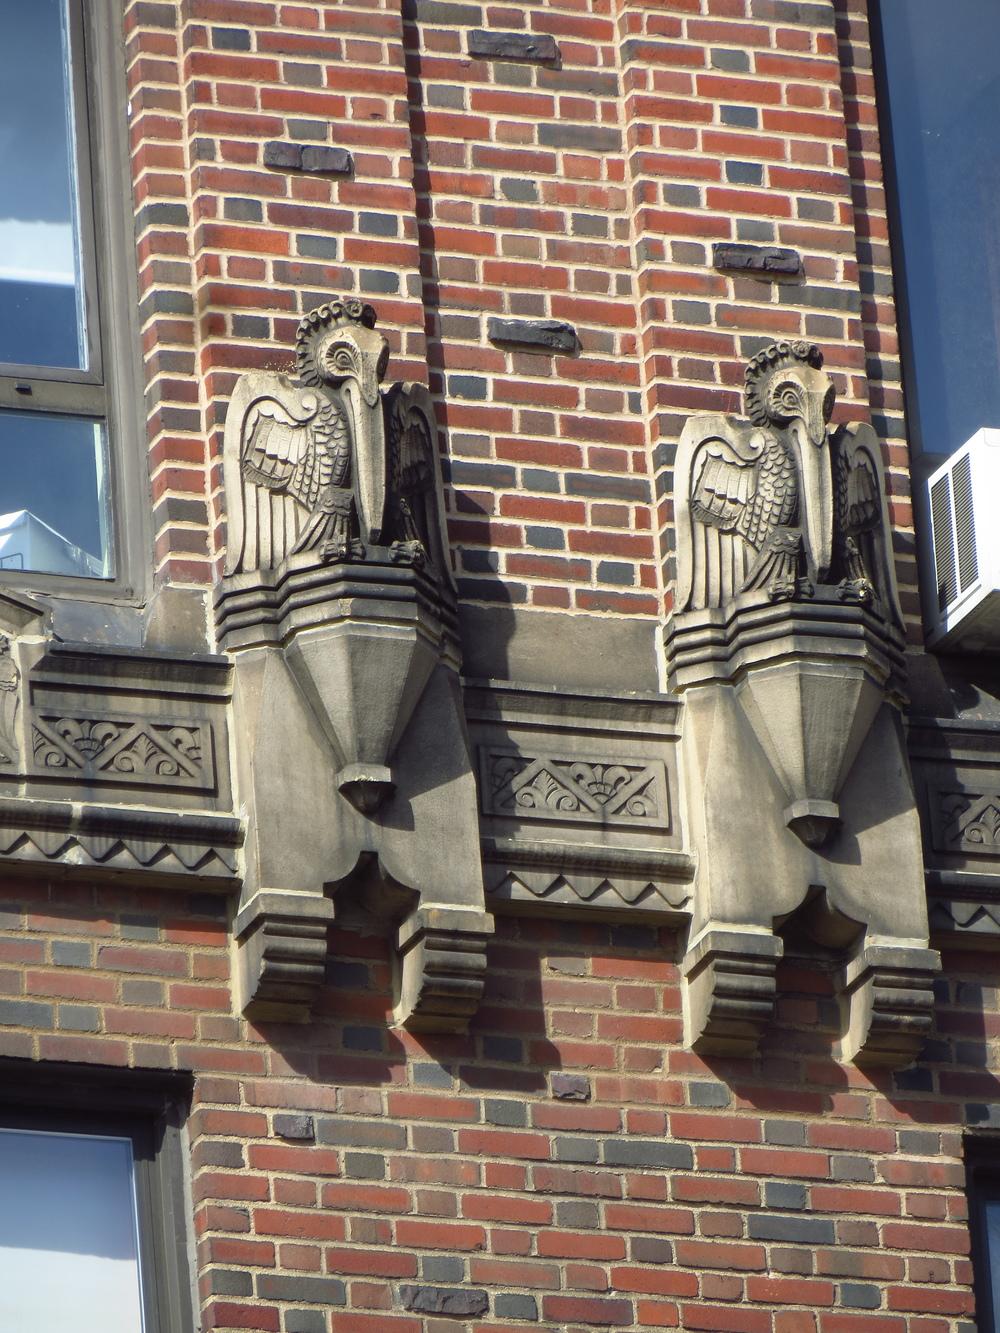 Pelican statues